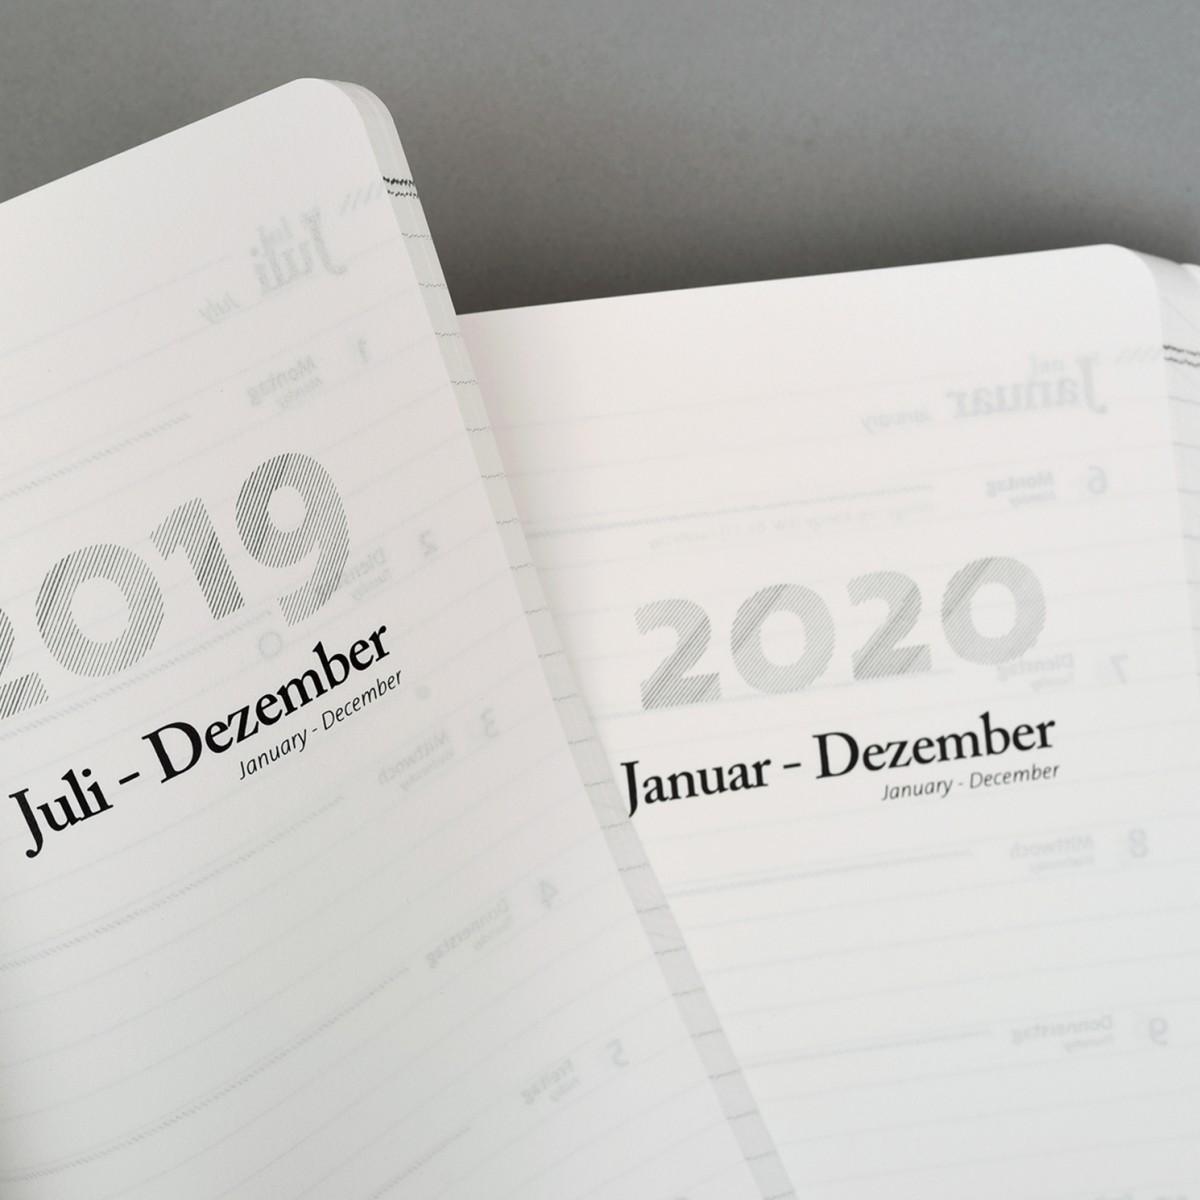 tyyp Kalender 19/2020, 18 Monate, Schwarz, DIN A5, Handmade